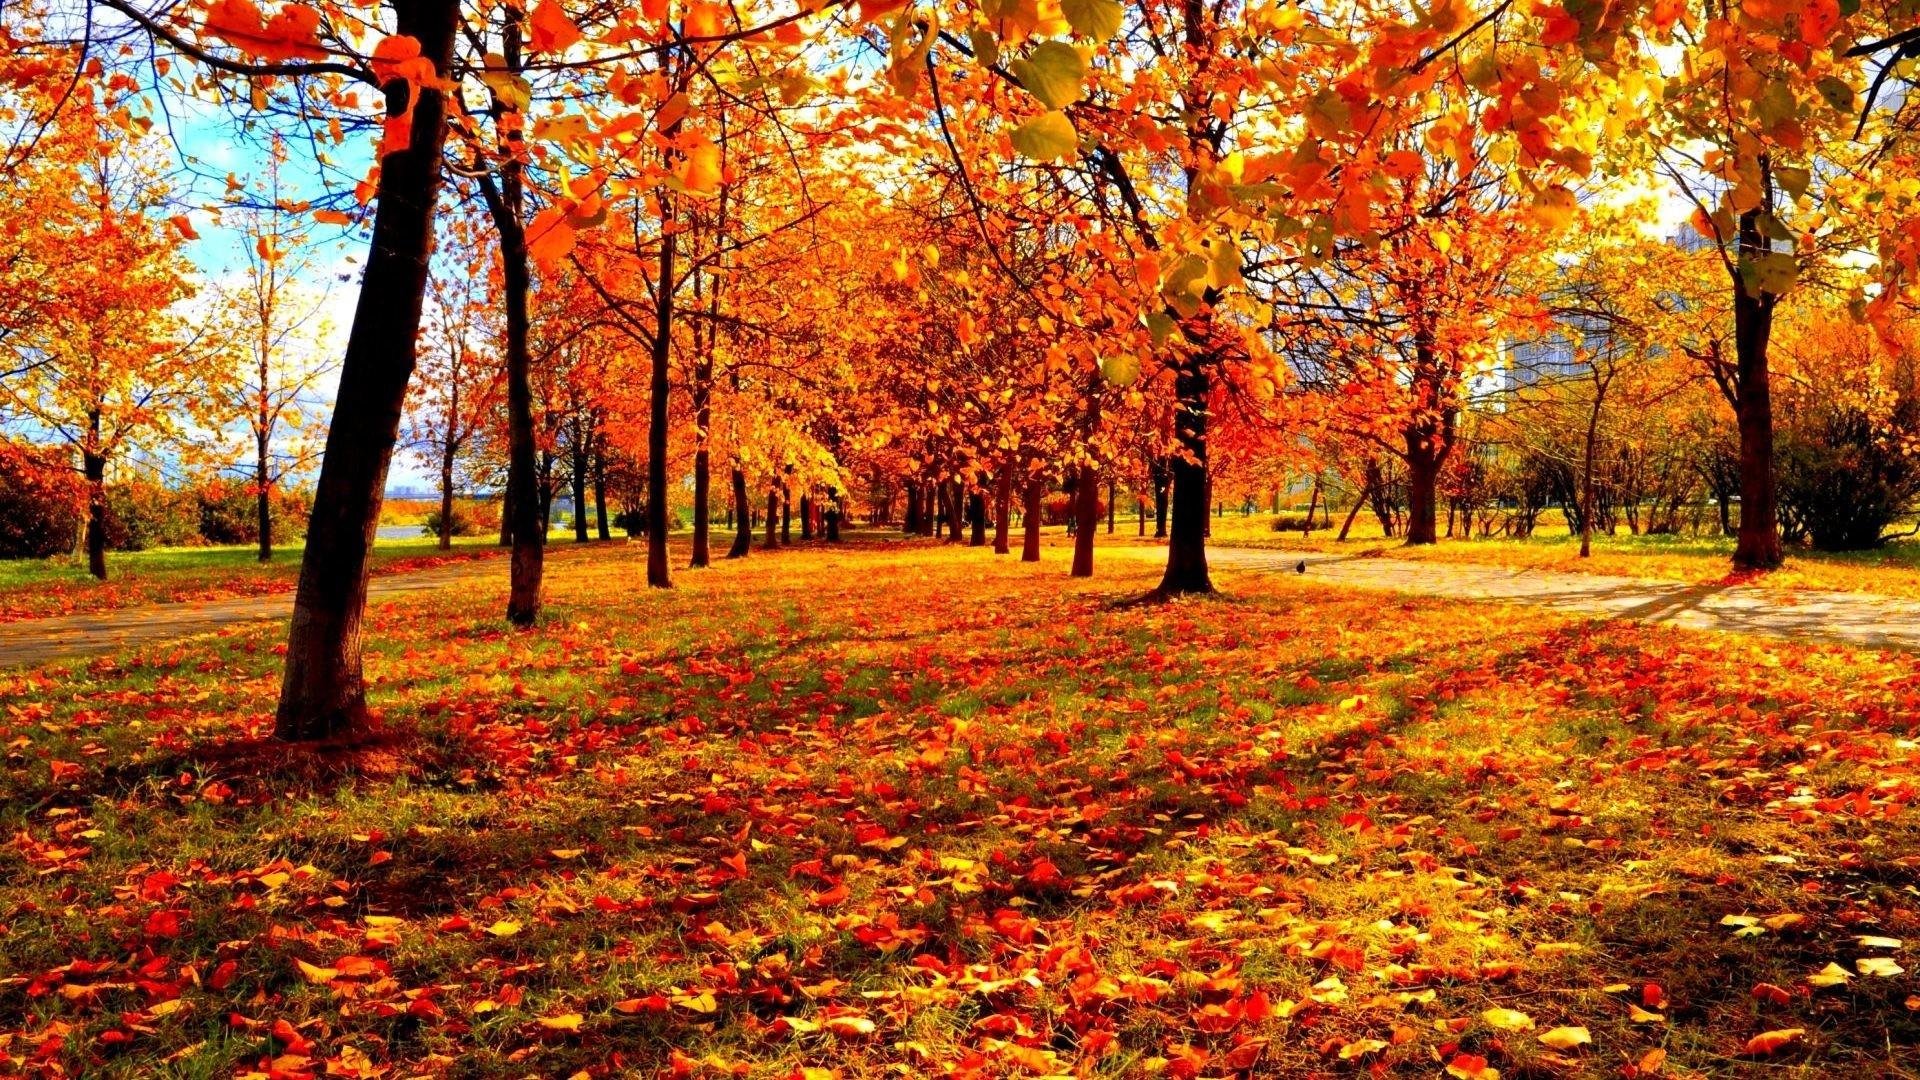 Leaf Tag – Leaves Leaf Fall Seasons Tree Autumn Nature Forest Color Season  Landscape 3d Wallpaper